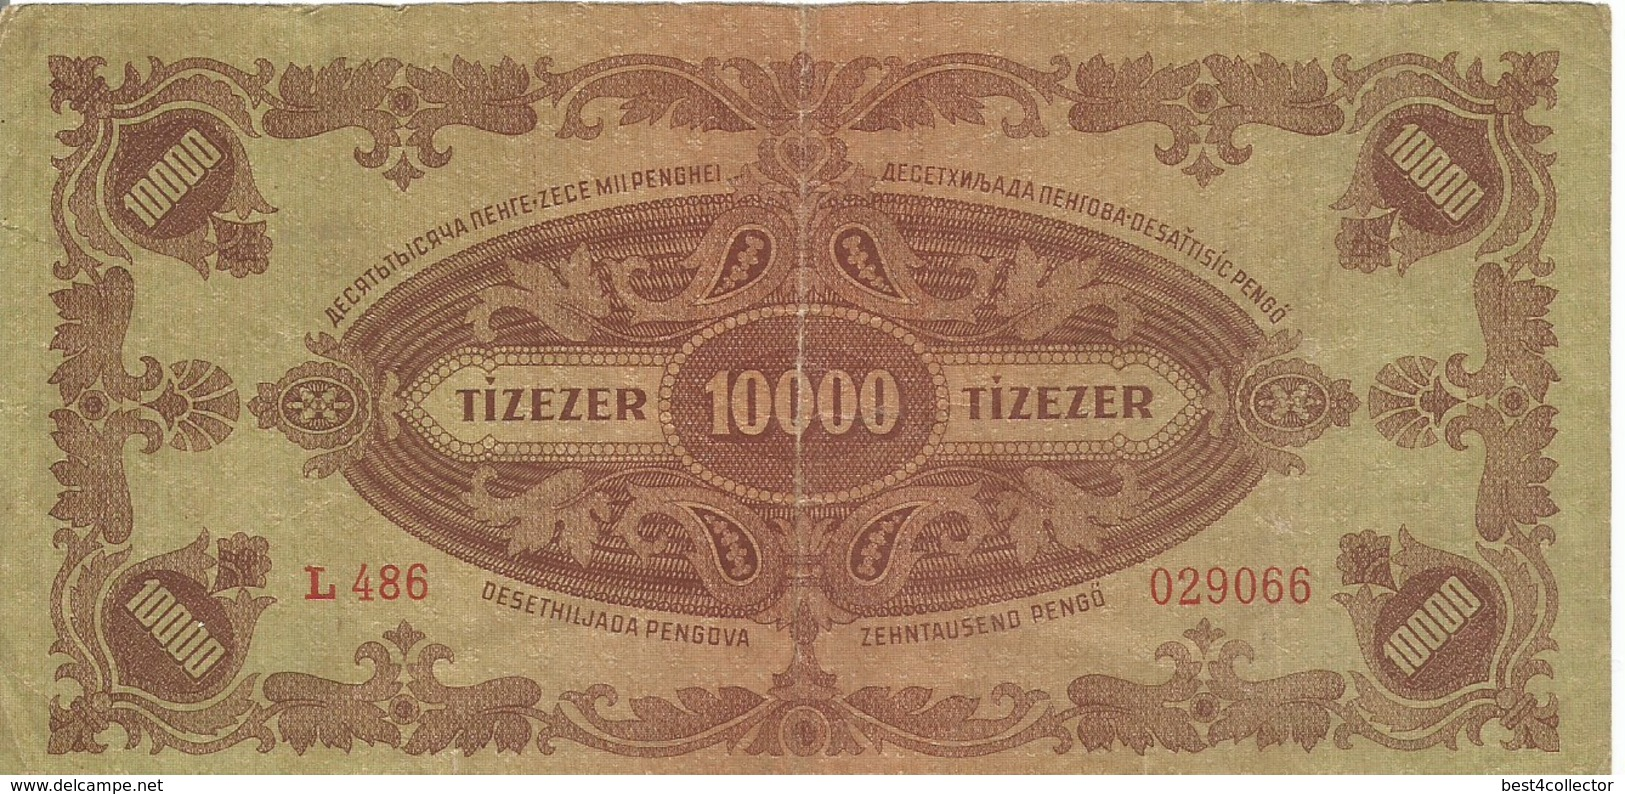 Ungheria Tizezer Pengö  1945 Bank Note - Hungary